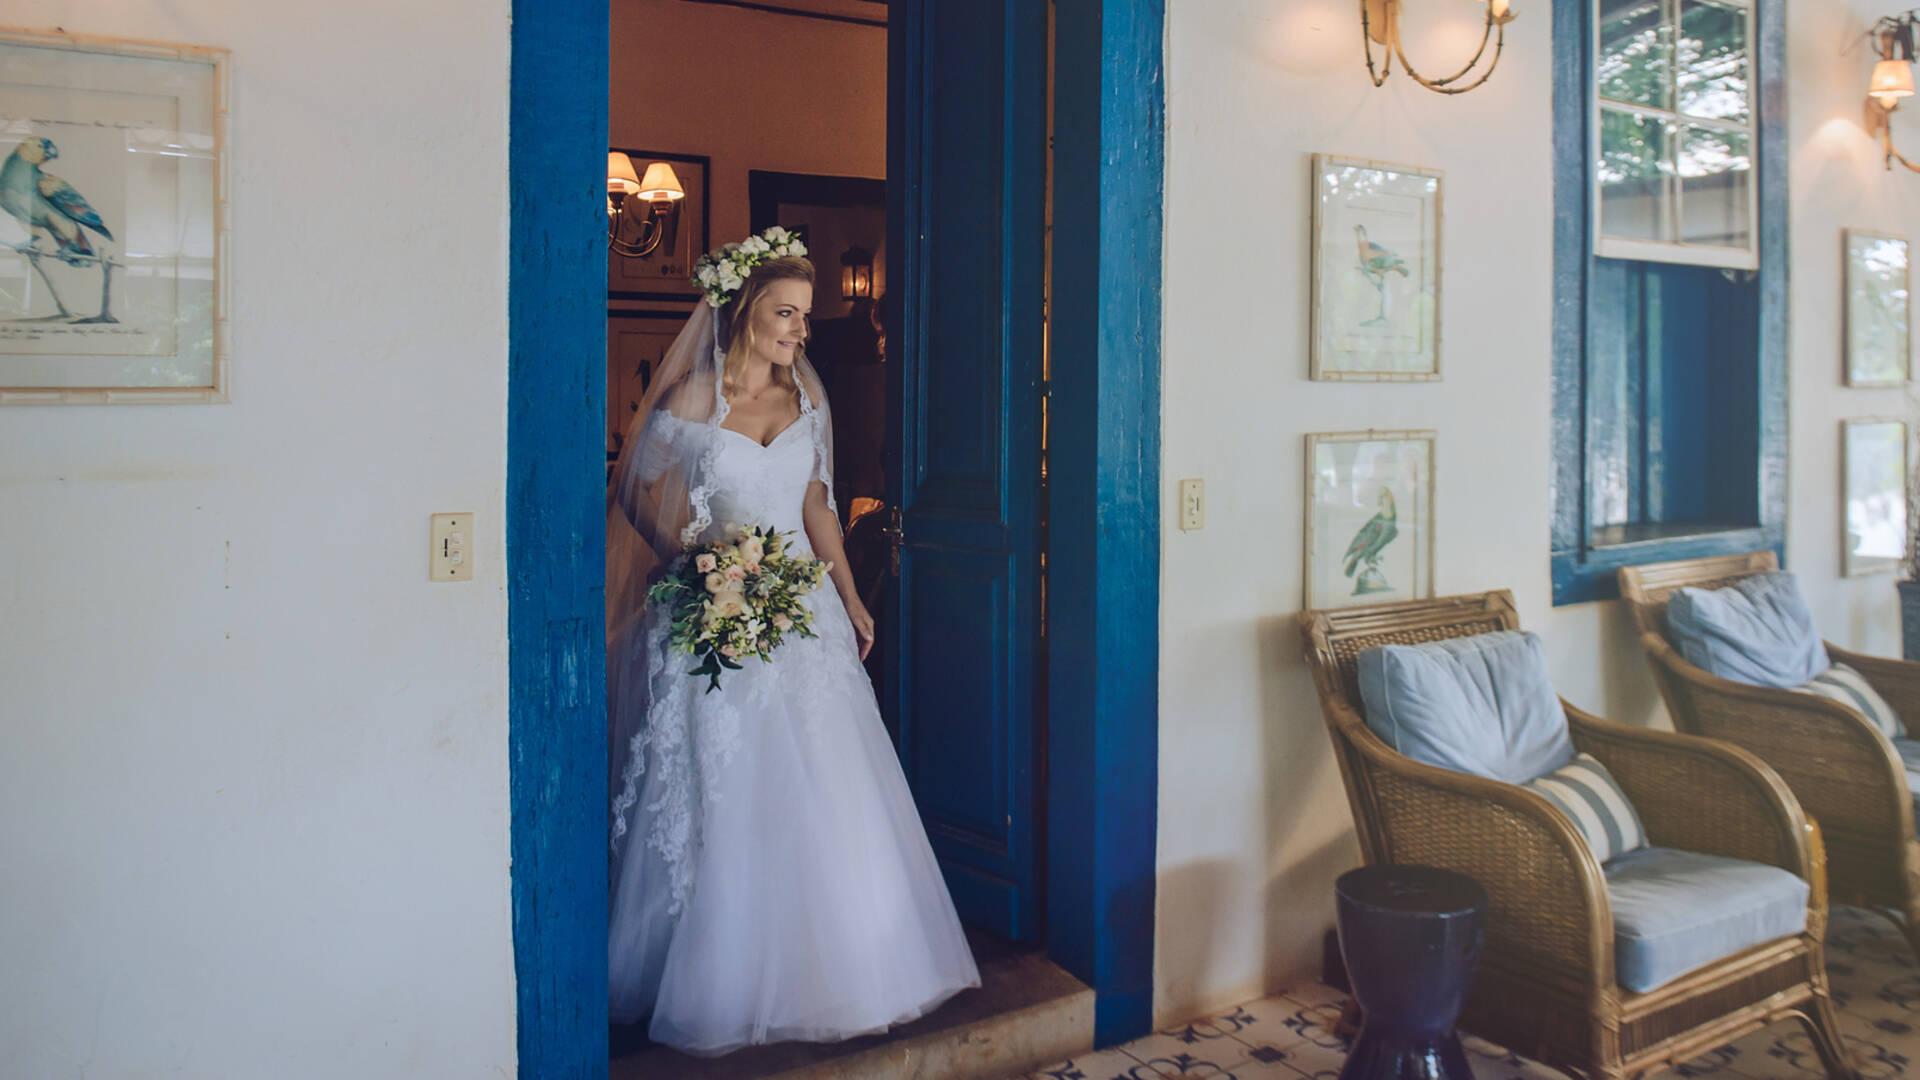 Casamentos de Fazenda Lajeado - Helo e Vitor